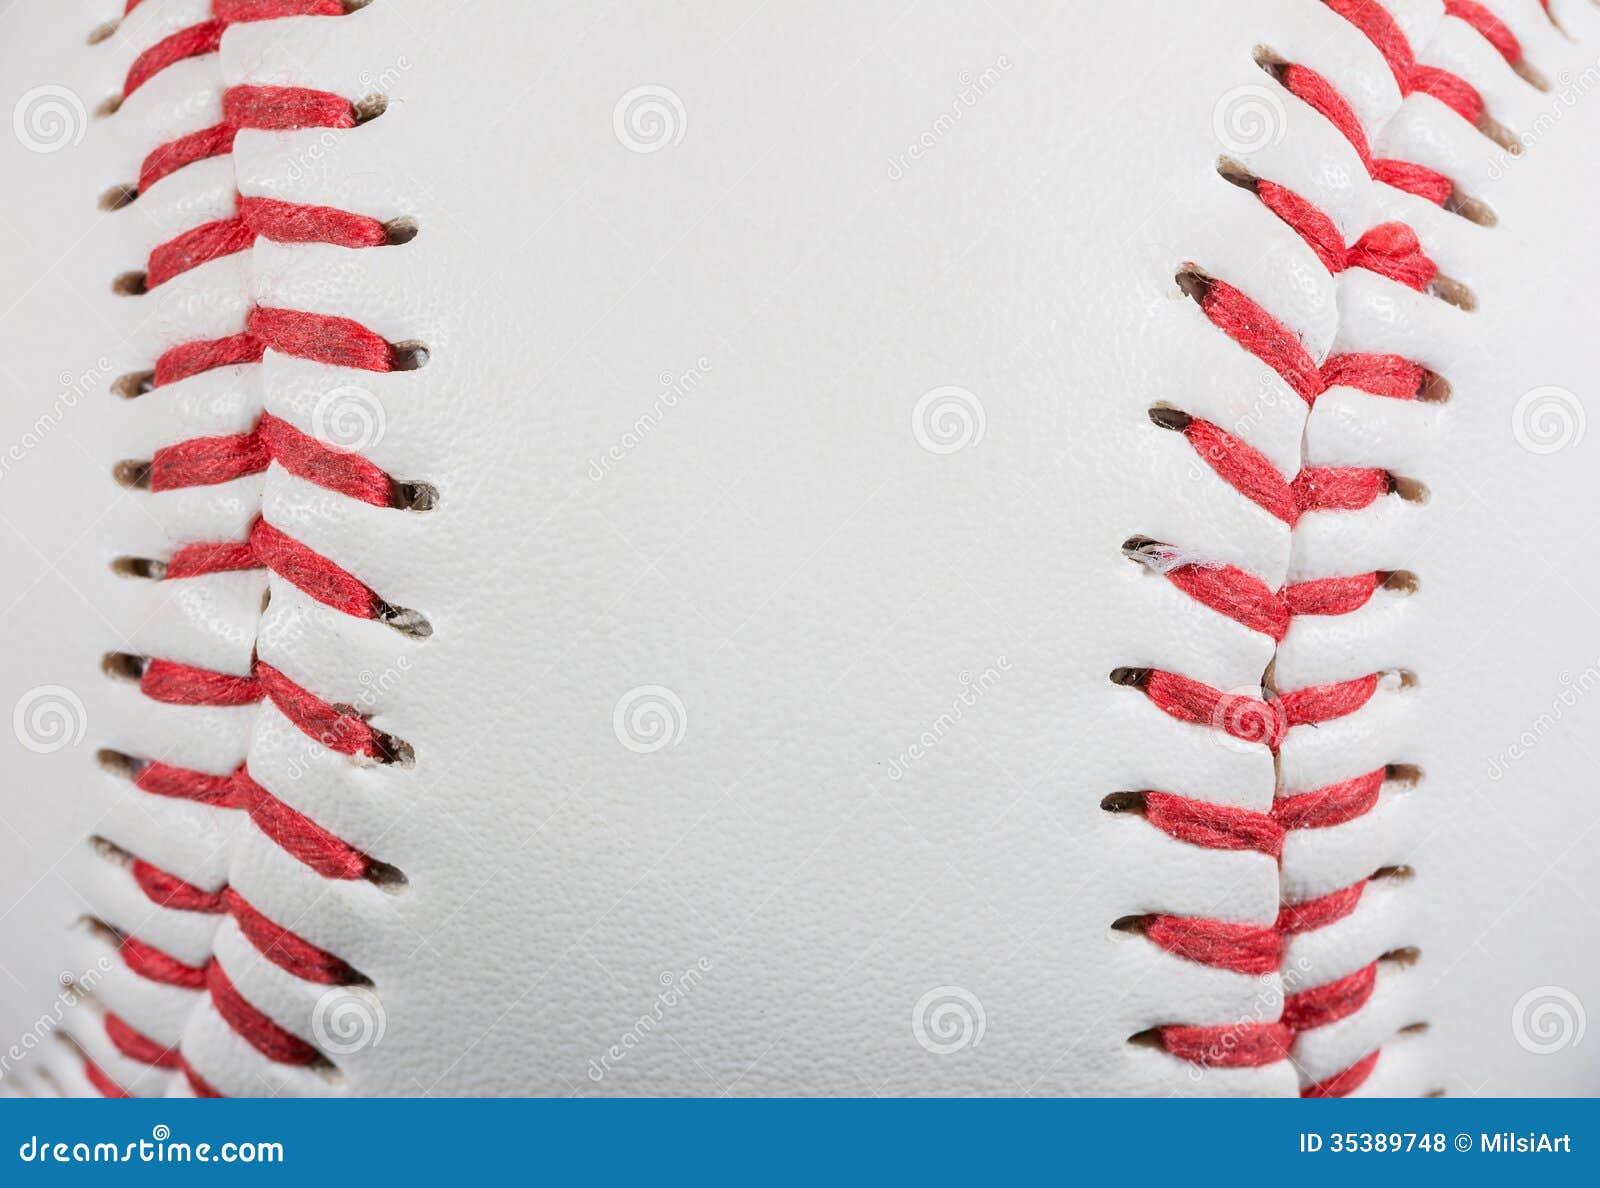 Baseball-Ball-Rahmen stockfoto. Bild von grunge, auszug - 35389748